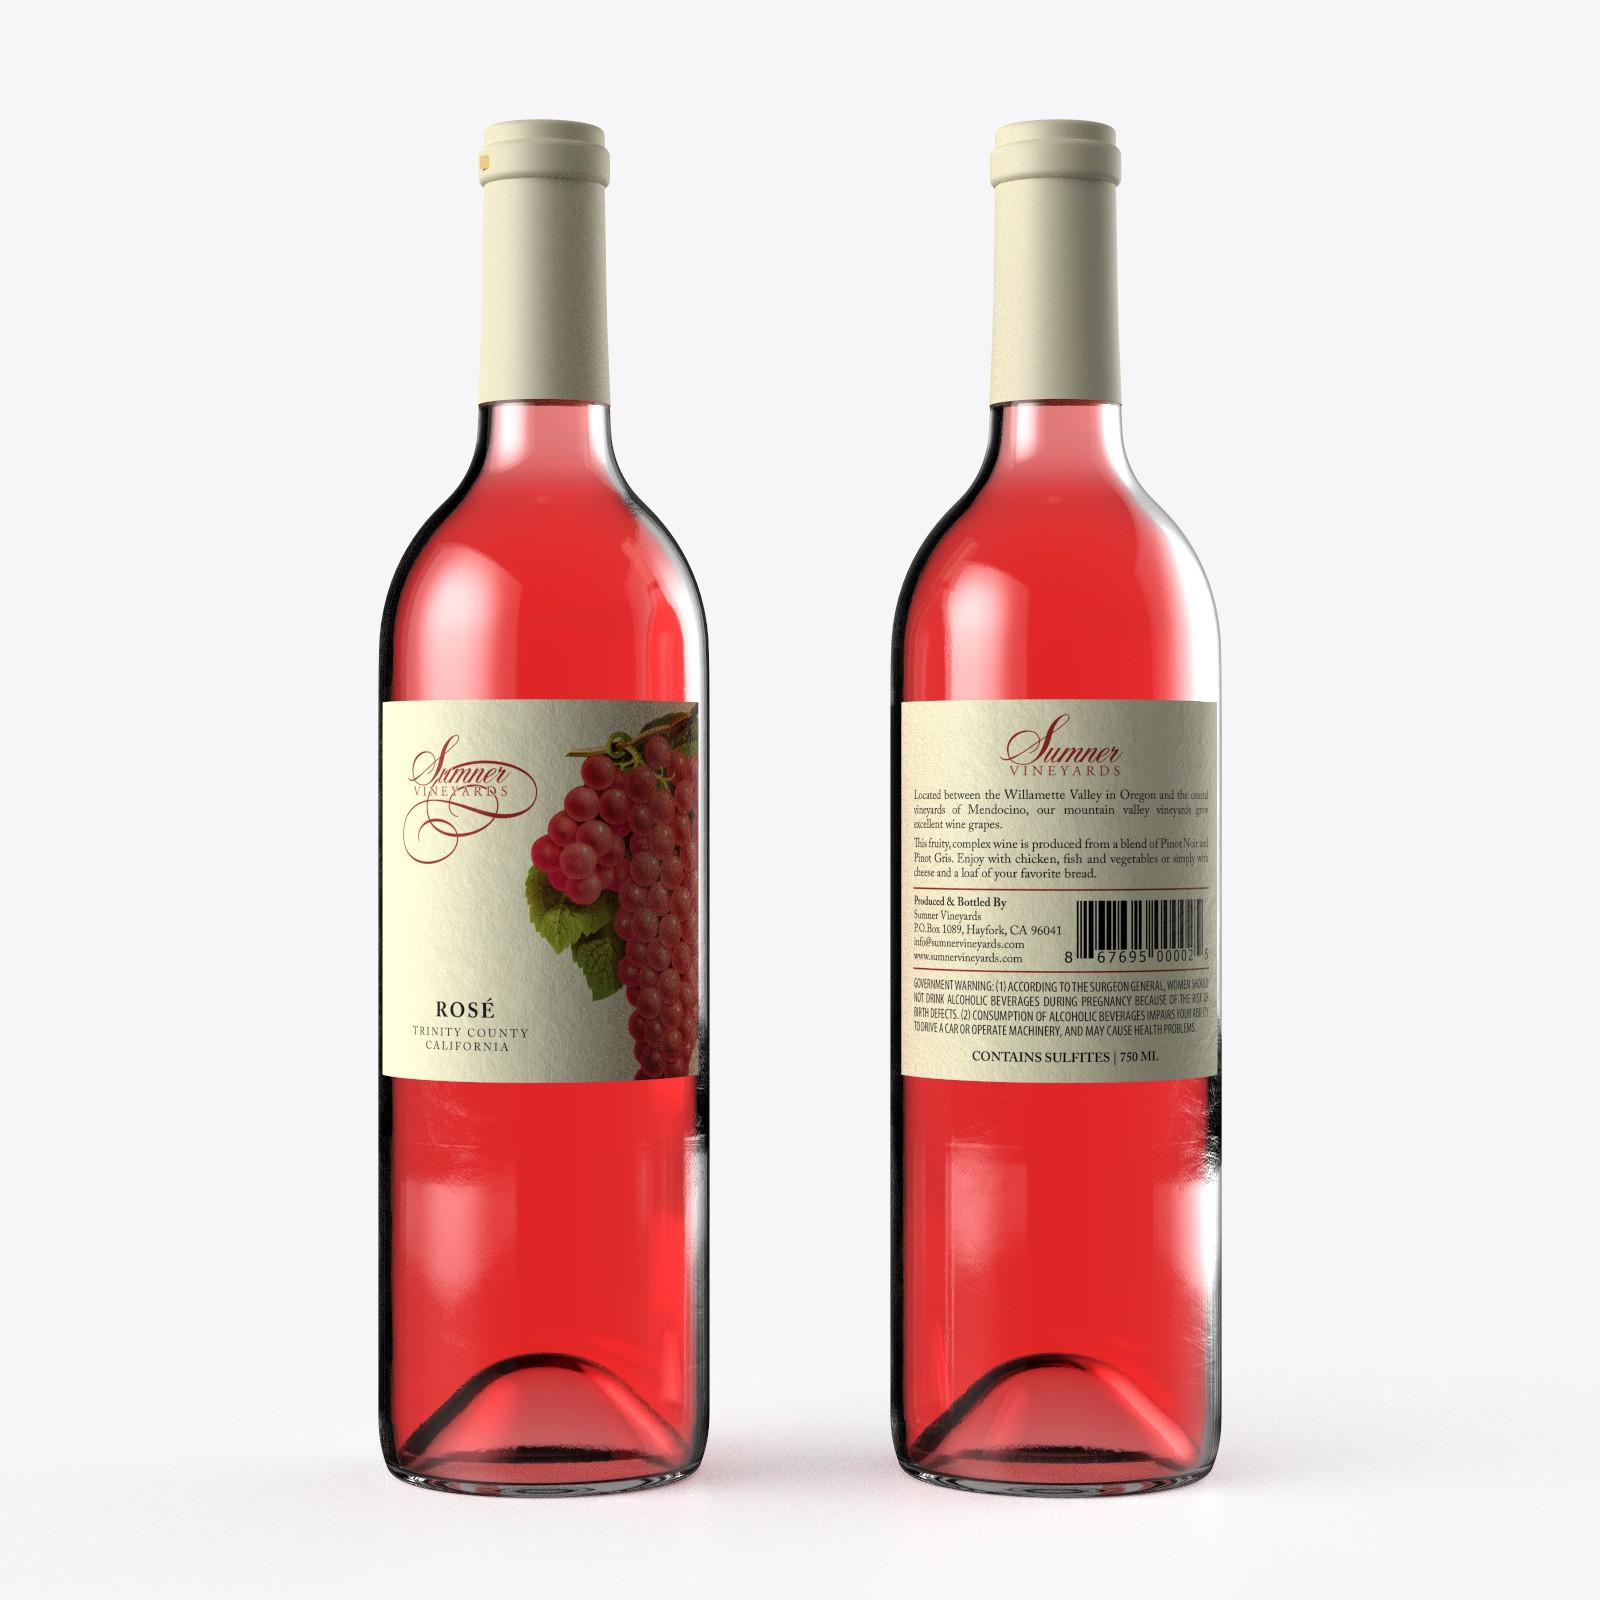 Create an eye catching label design for Sumner Vineyards Rose' Wine